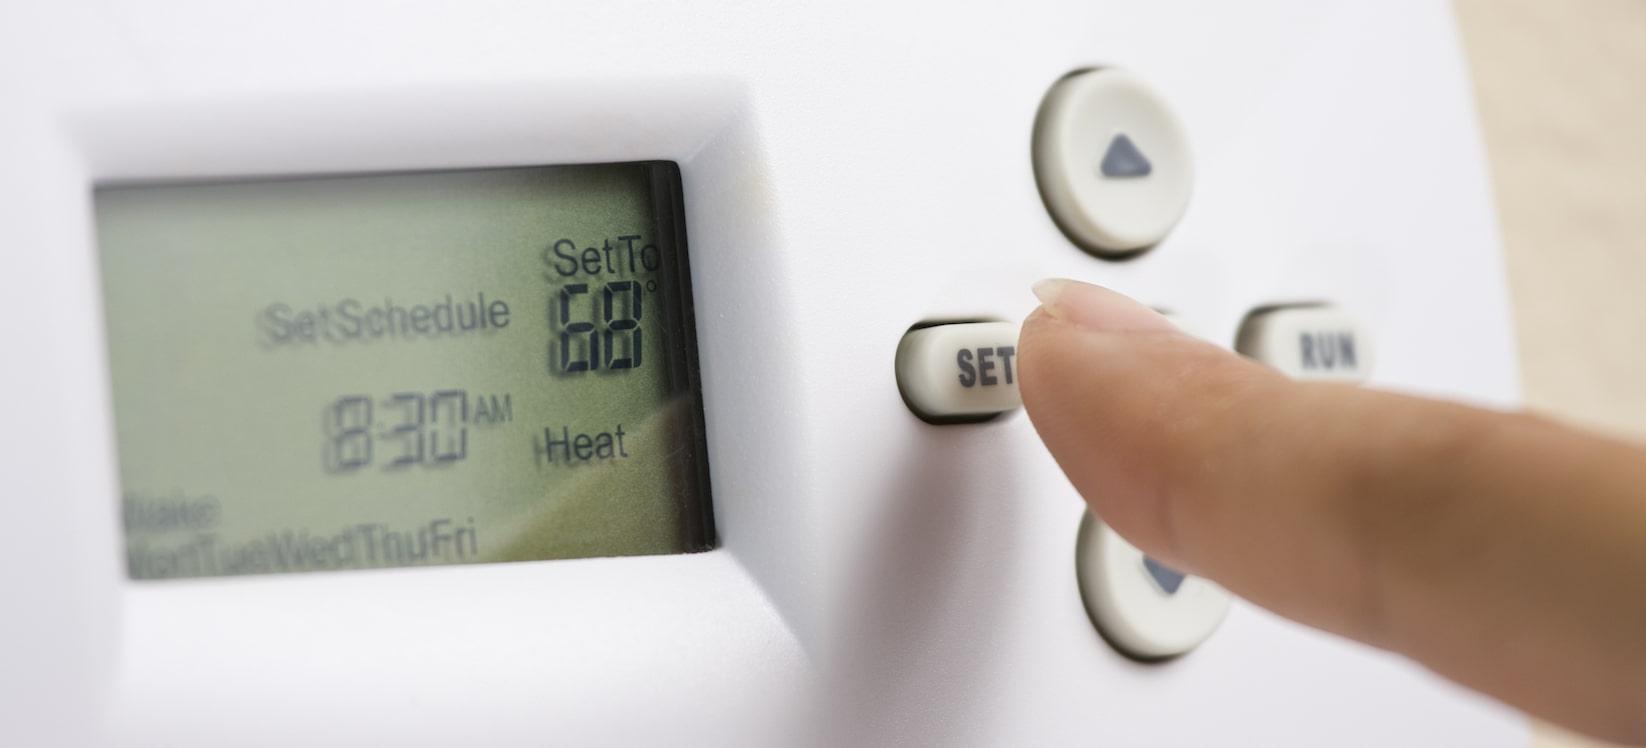 Thermostat Configuration